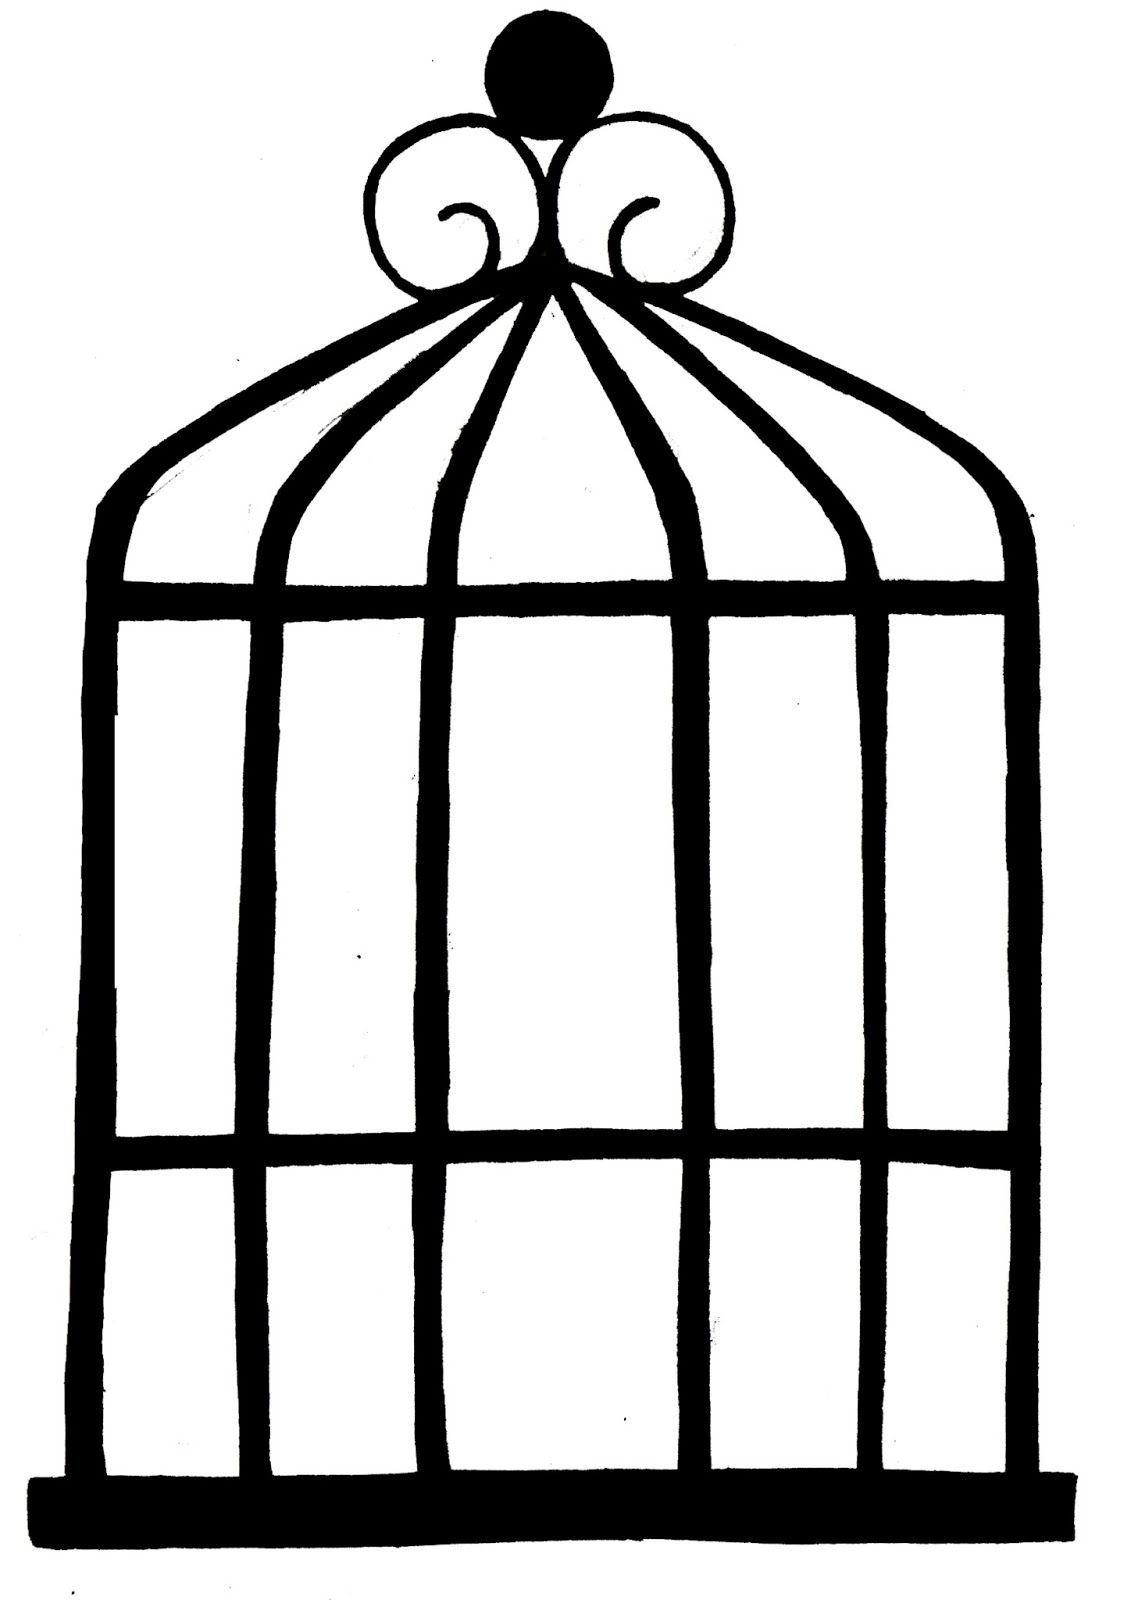 Birdcage Clipart